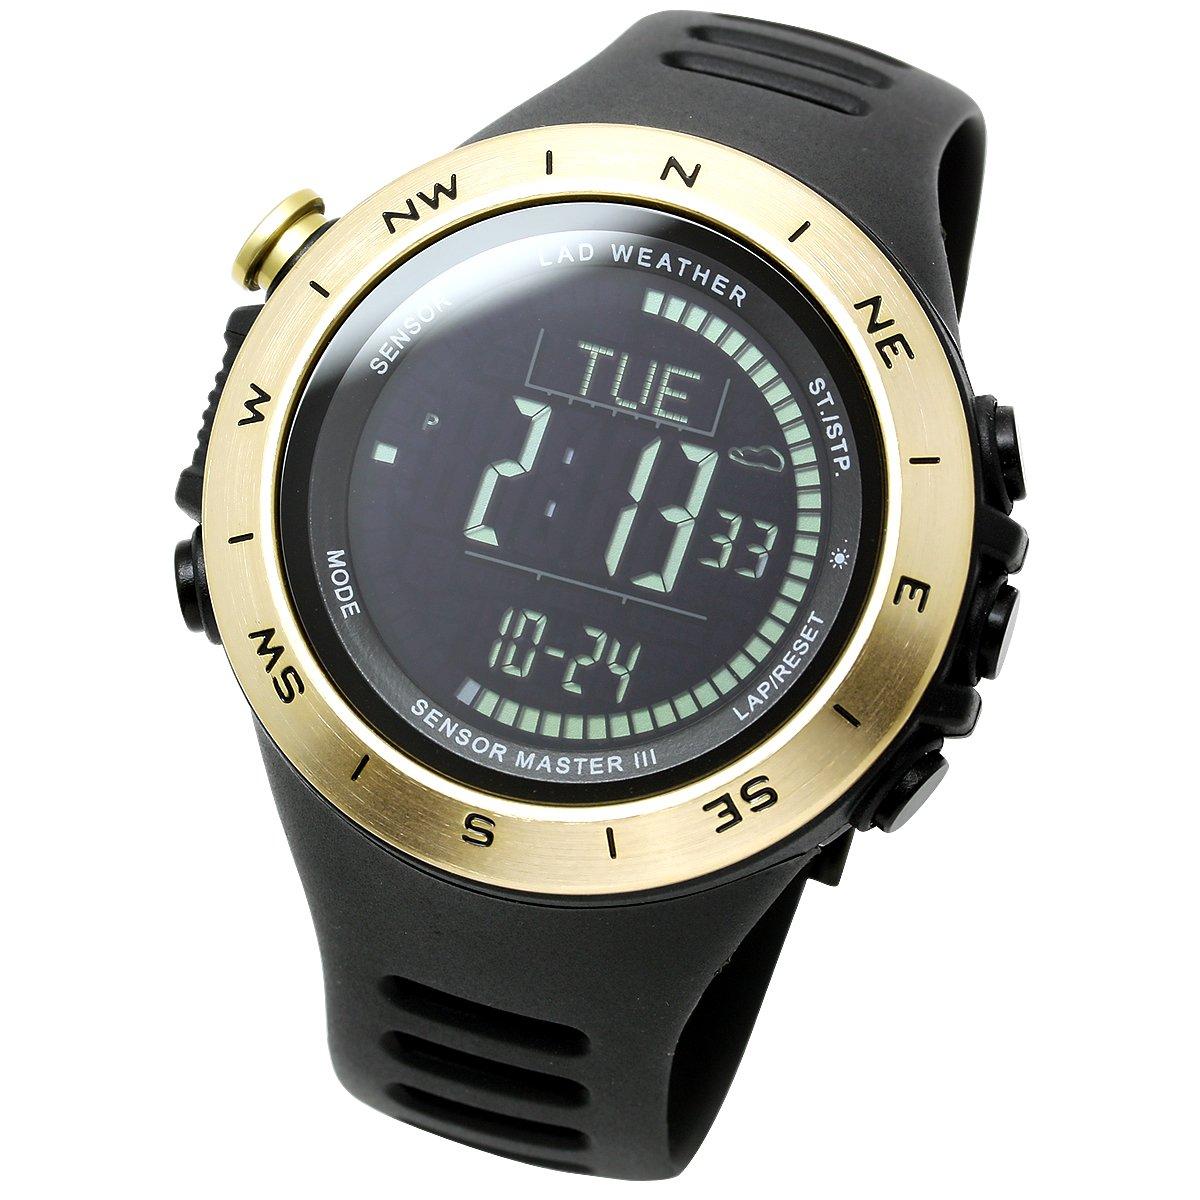 [Lad Weather] resistente al agua hasta 100metros Altímetro Barómetro Alarma Tormenta calorías contador de pasos de datos Montaña reloj unisex